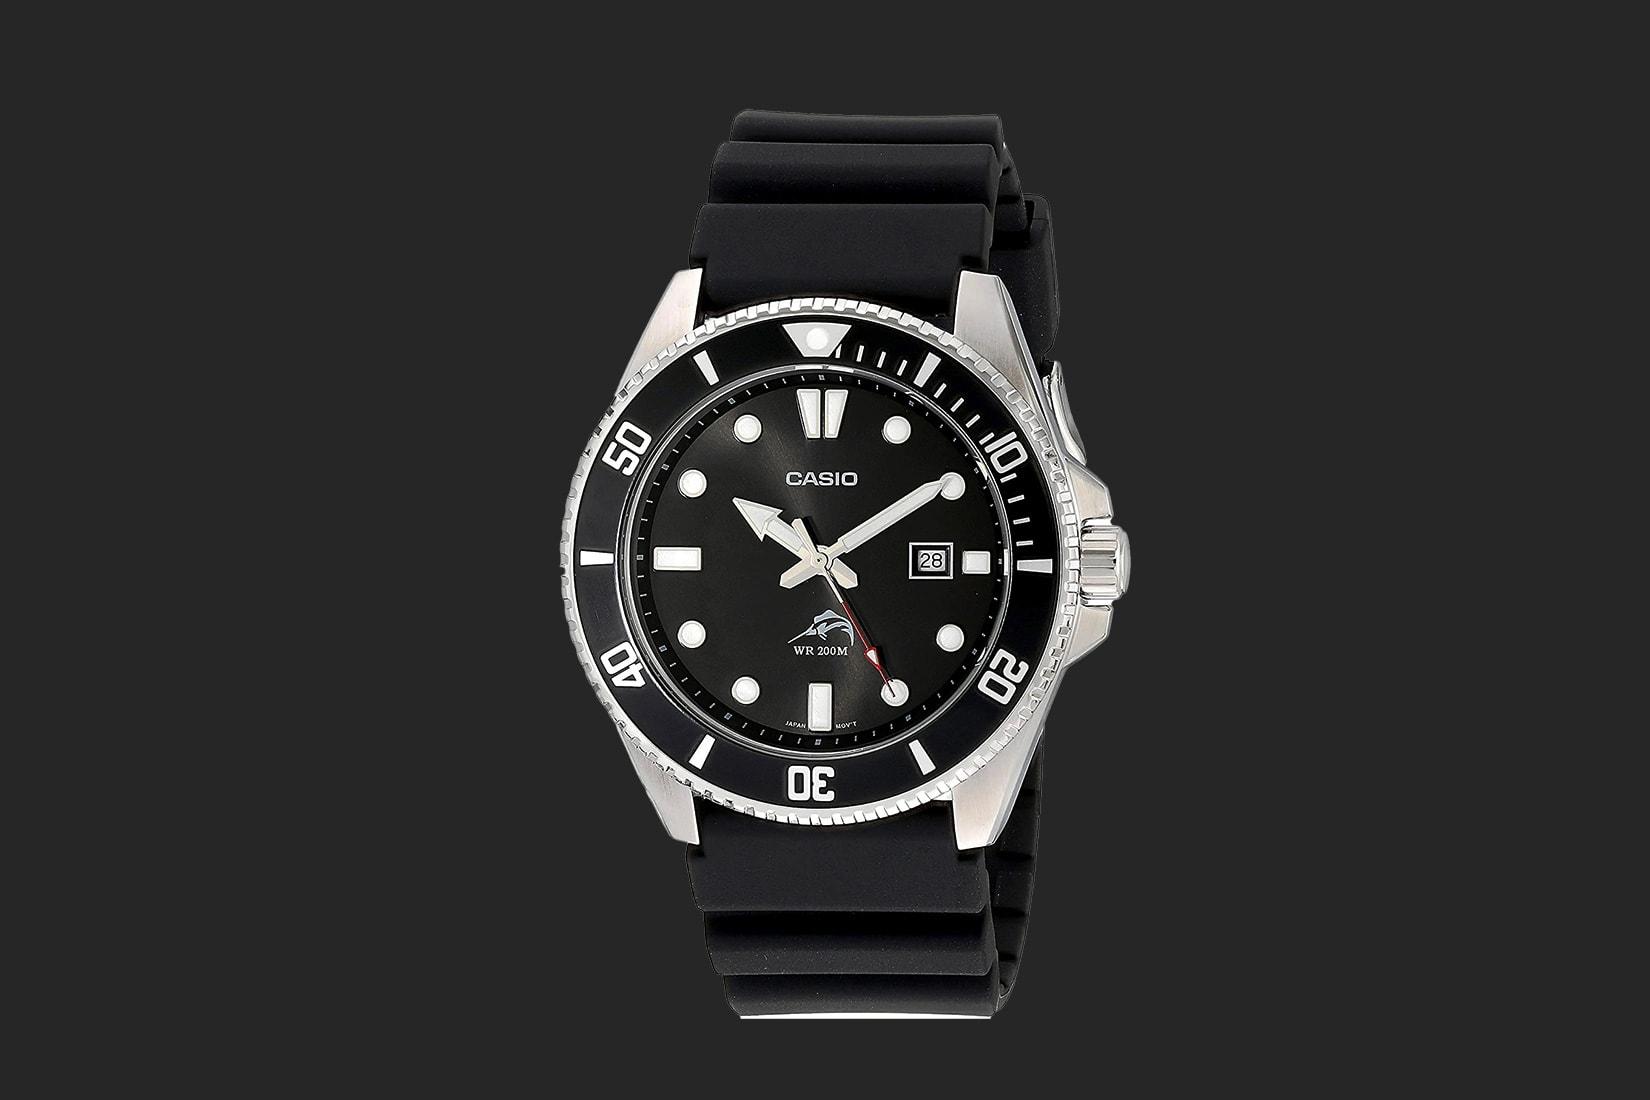 best dive watch beginners casio MDV106-1AV review - Luxe Digital